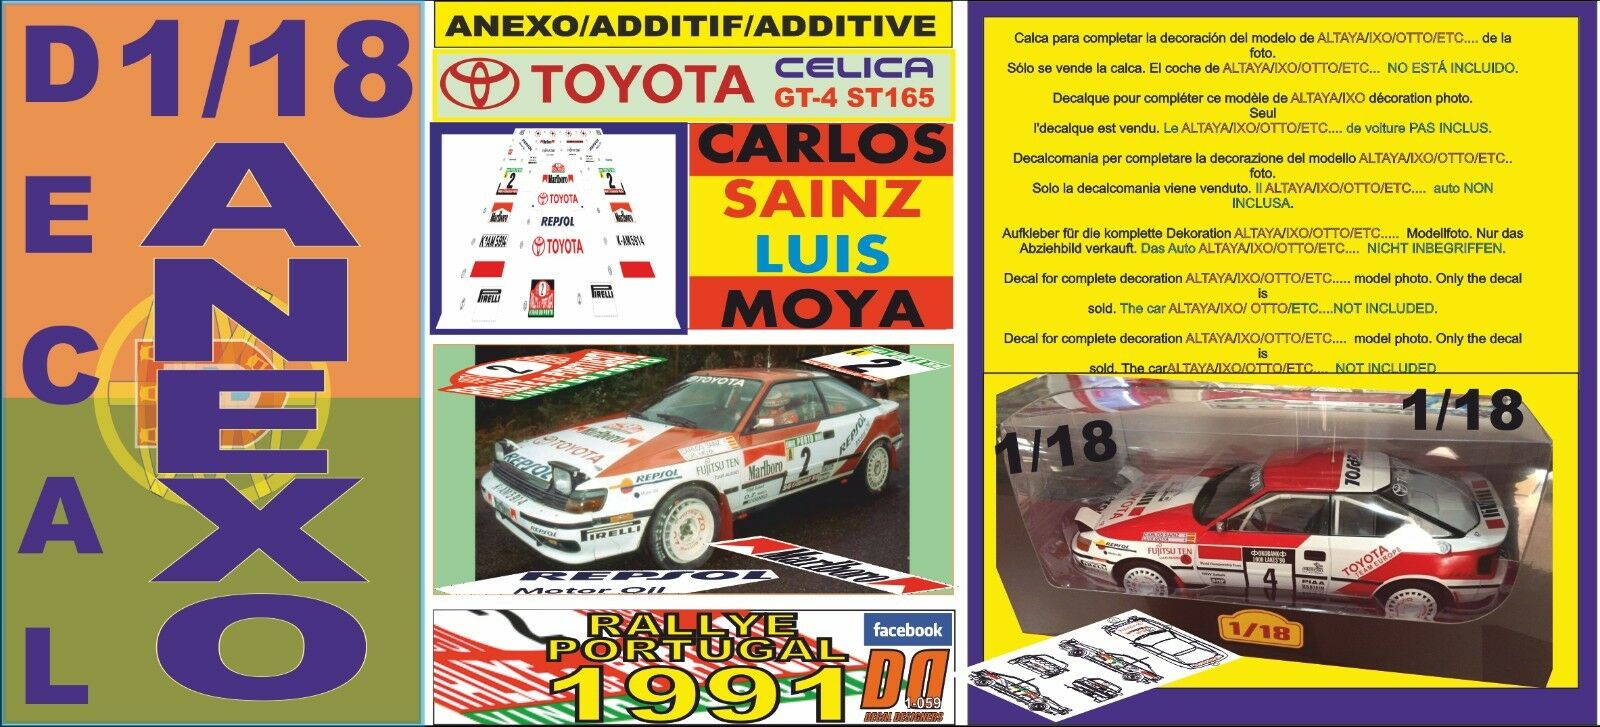 ANEXO DECAL 1 18 TOYOTA CELICA CARLOS SAINZ RALLY PORTUGAL 1991 (12)